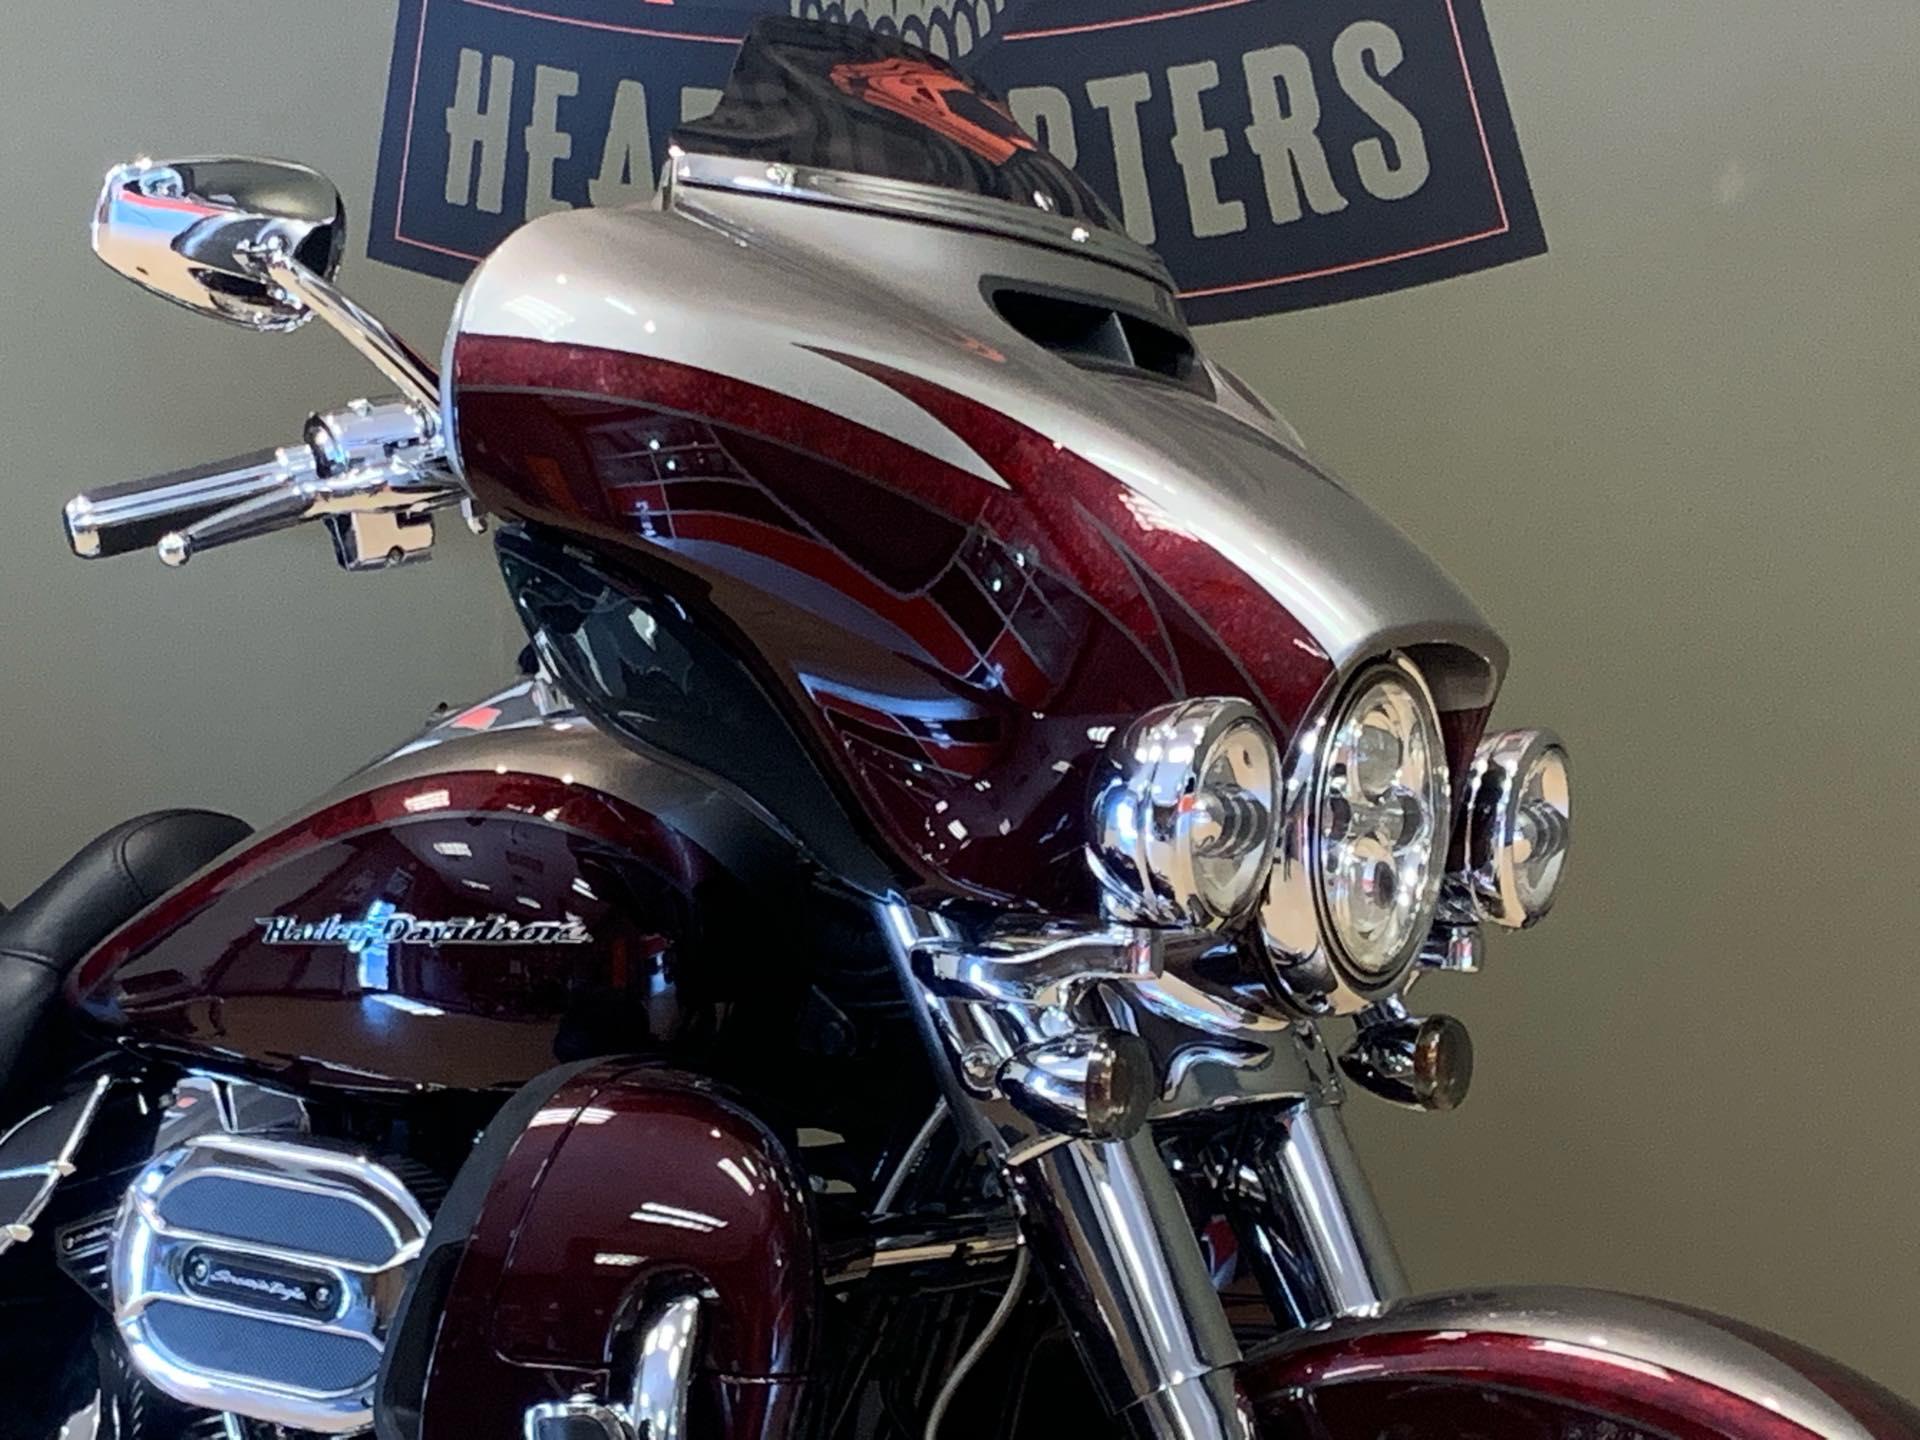 2015 Harley-Davidson Electra Glide CVO Limited at Loess Hills Harley-Davidson